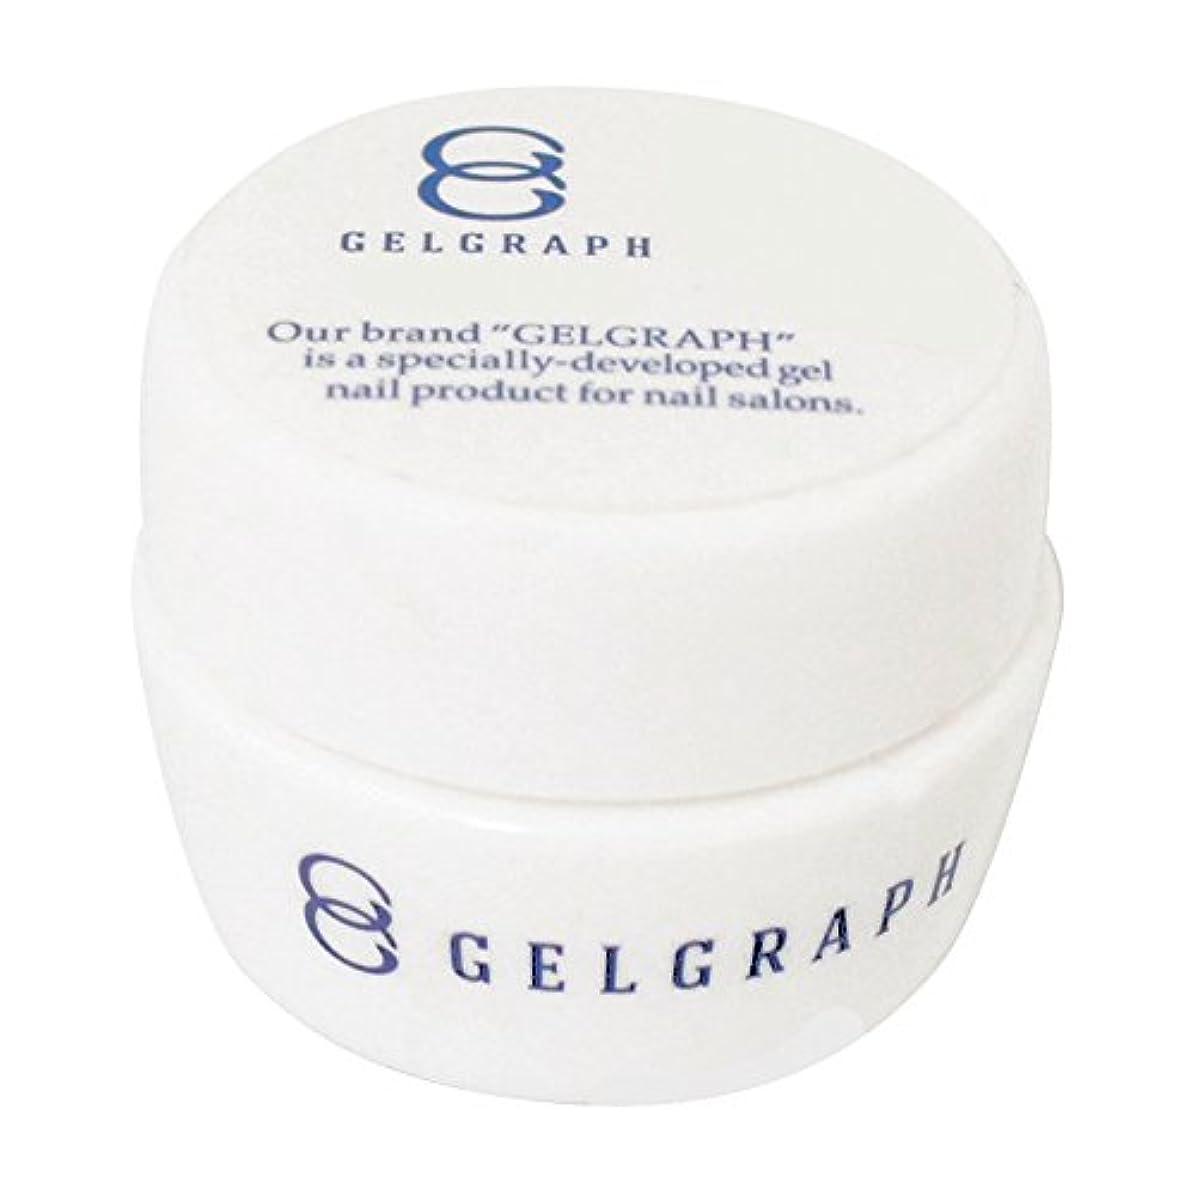 GELGRAPH カラージェル 106G ストロベリーミスト 5g UV/LED対応 ソークオフジェル